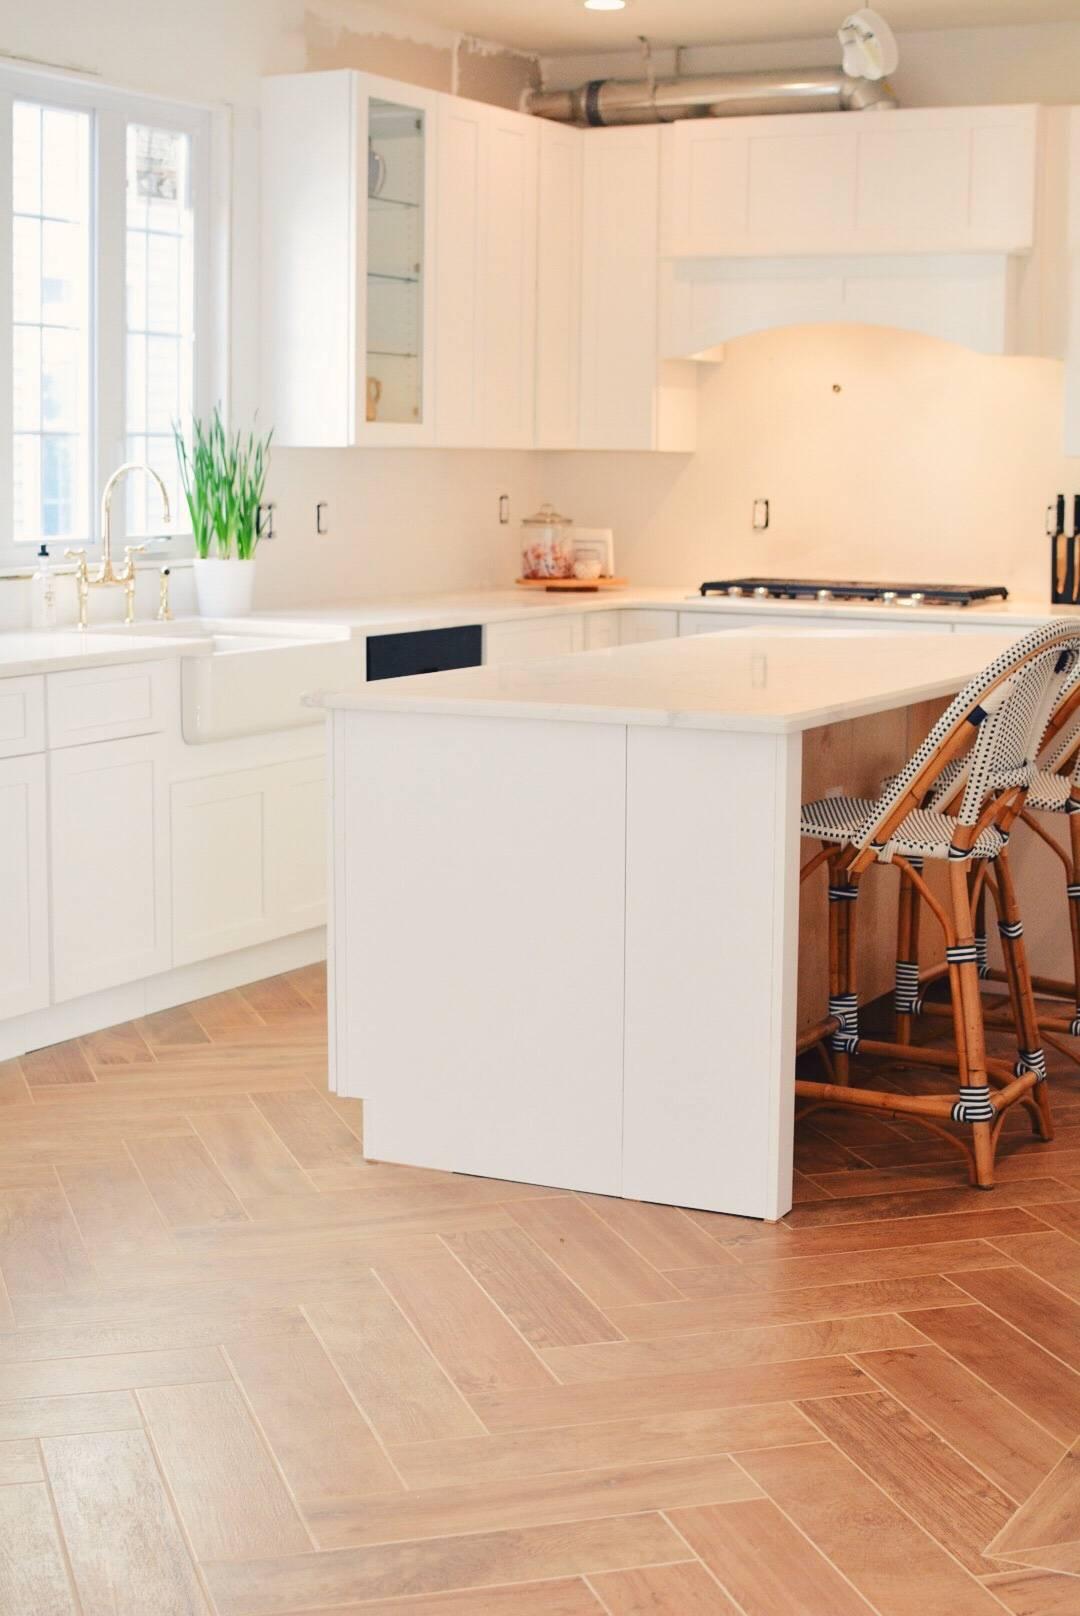 Kitchen Renovation Steps Herringbone Floors White Cabinets